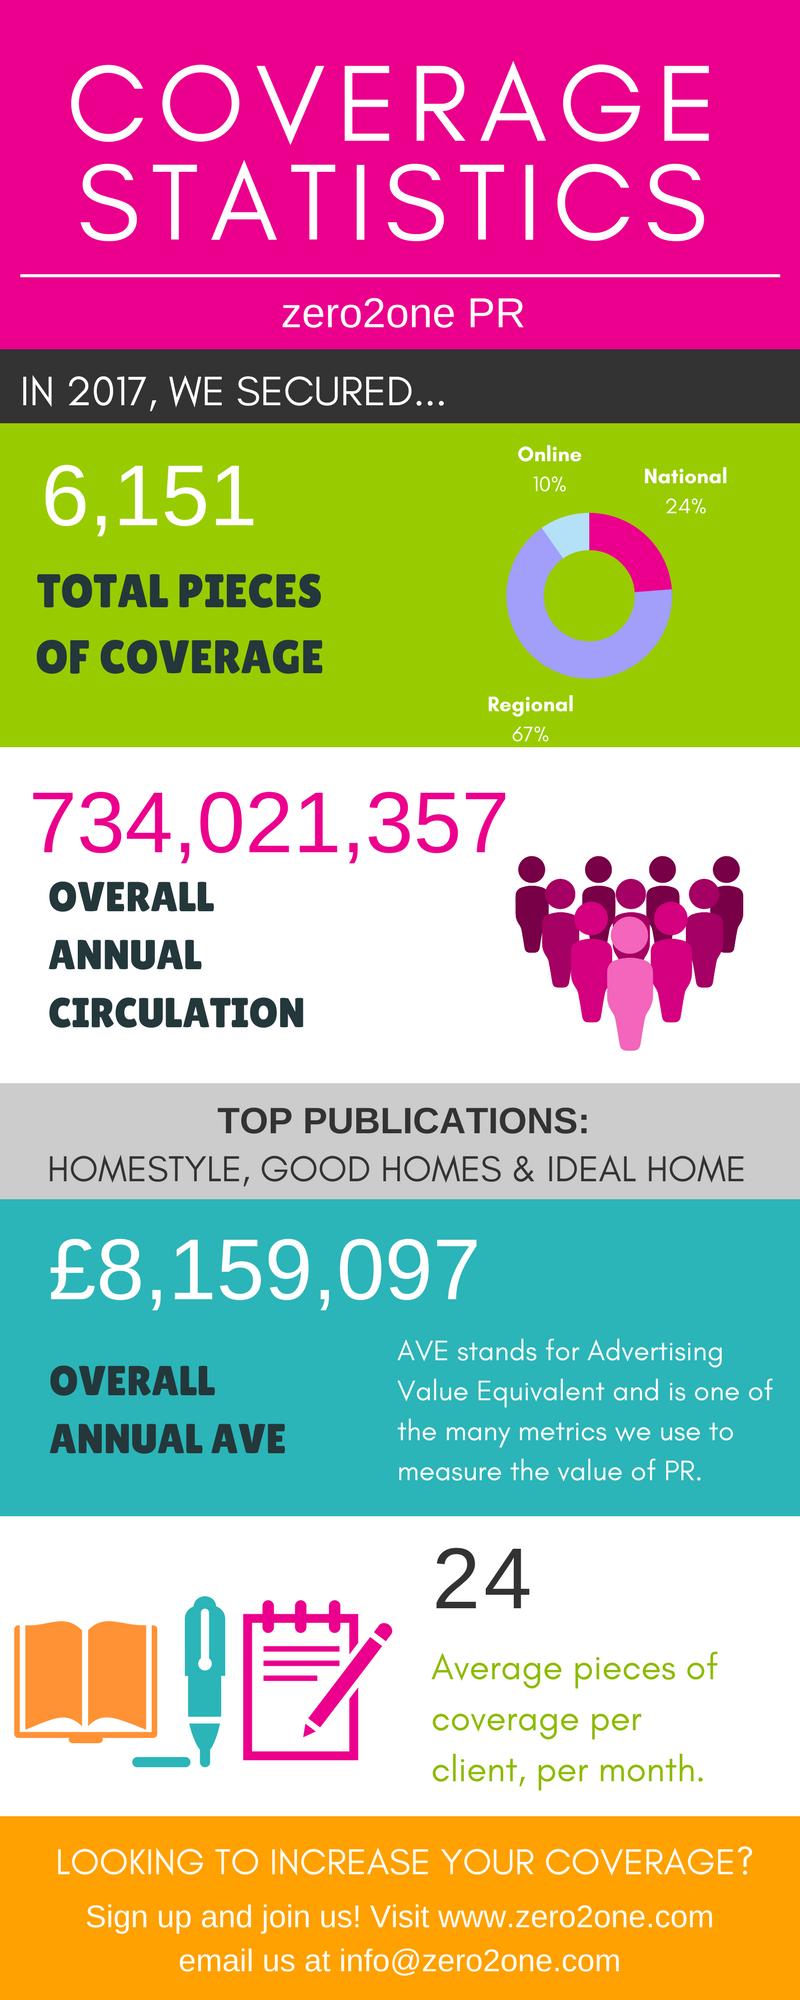 PR Press Coverage Statistics